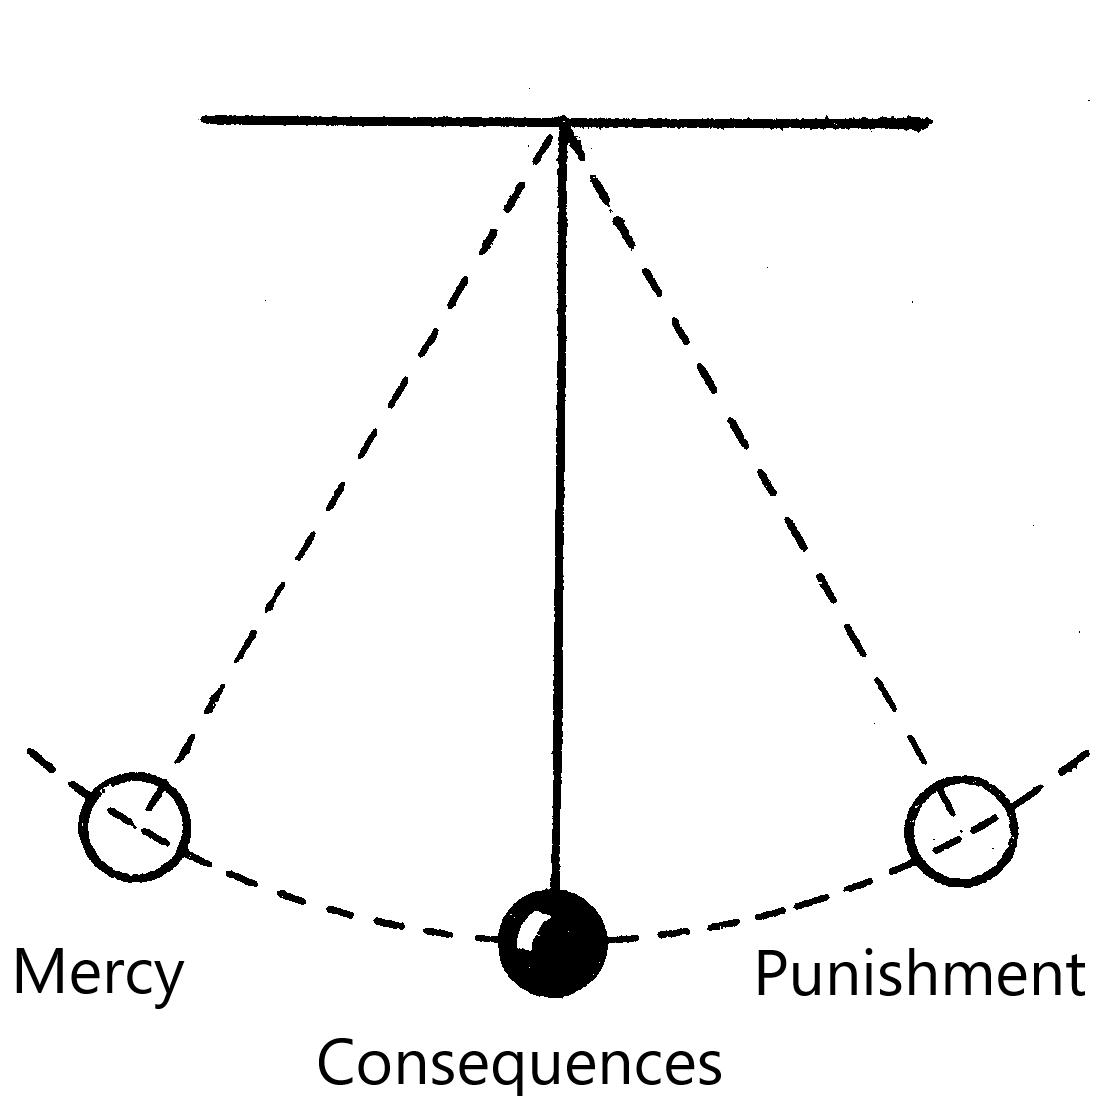 Pendulum swinging between Mercy, Consequences and Punishment.